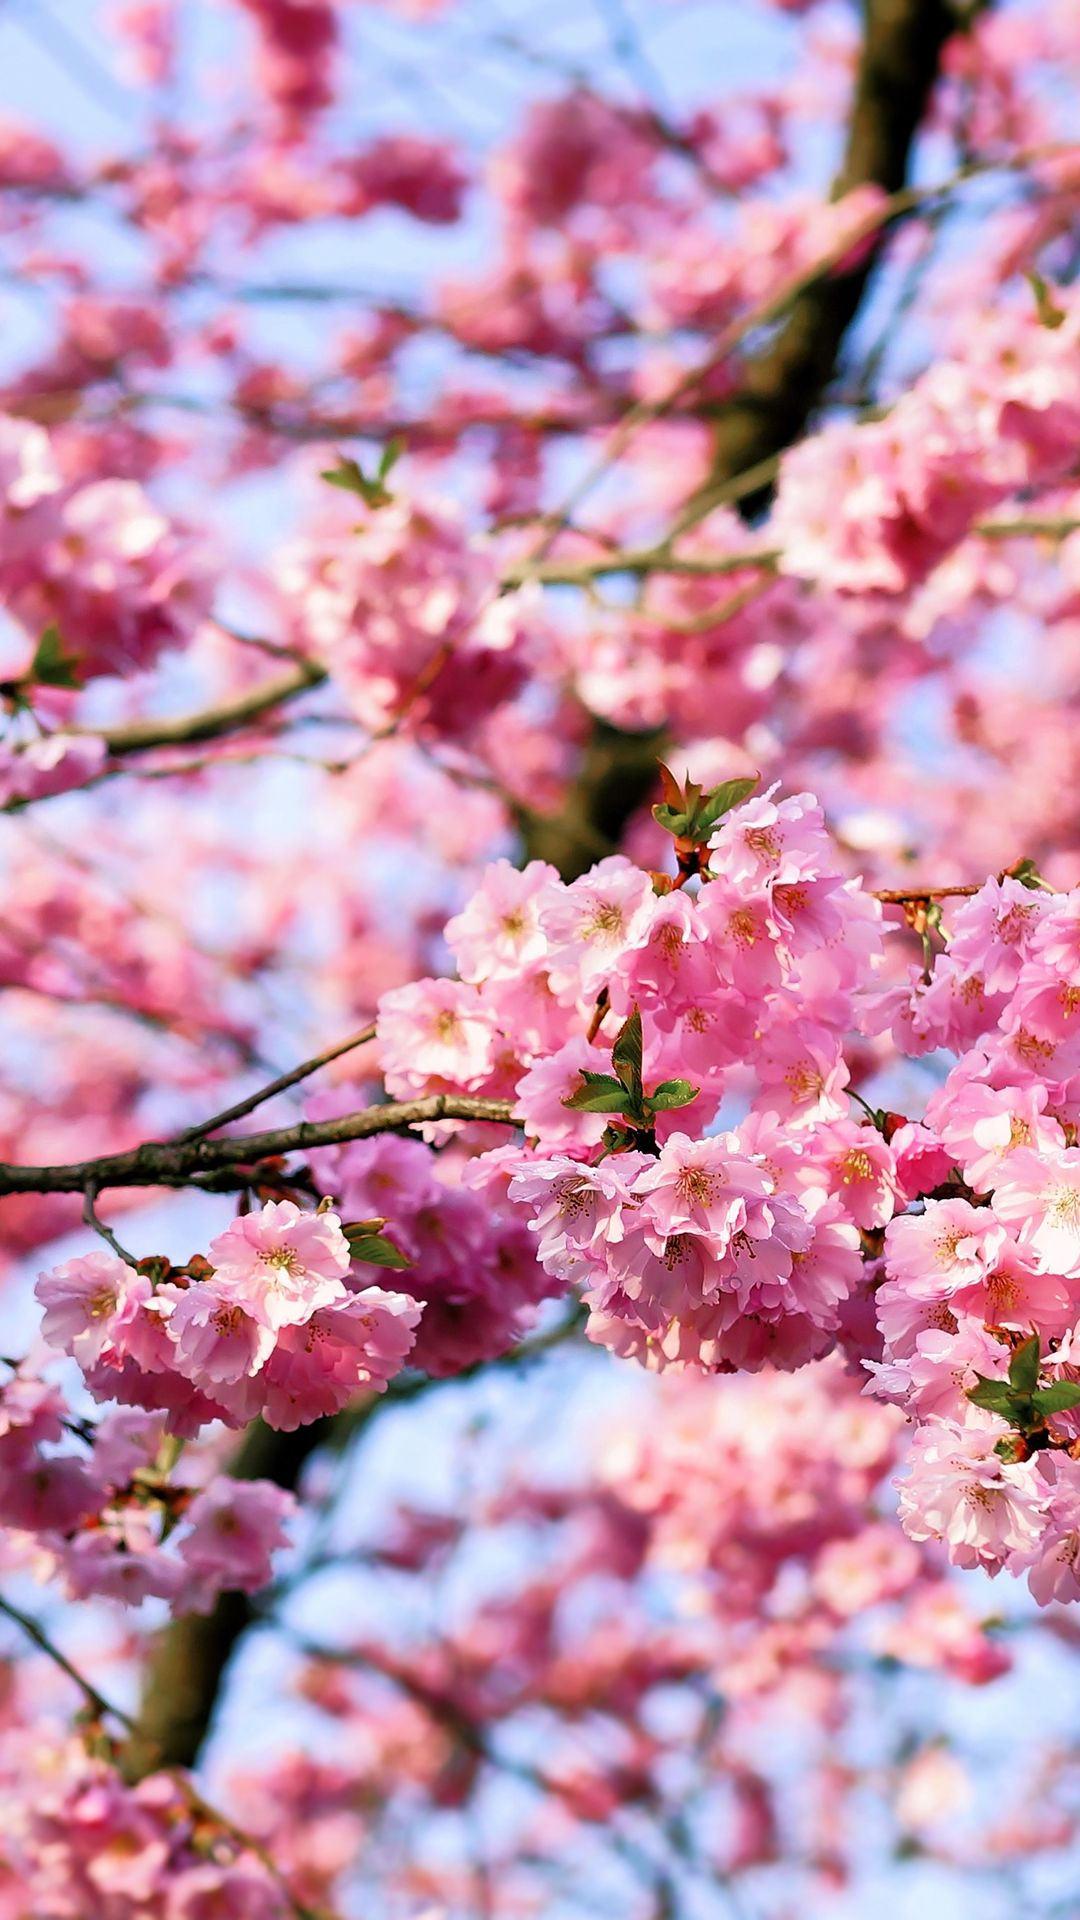 Cherry Blossom iPhone HD Wallpaper Gambar